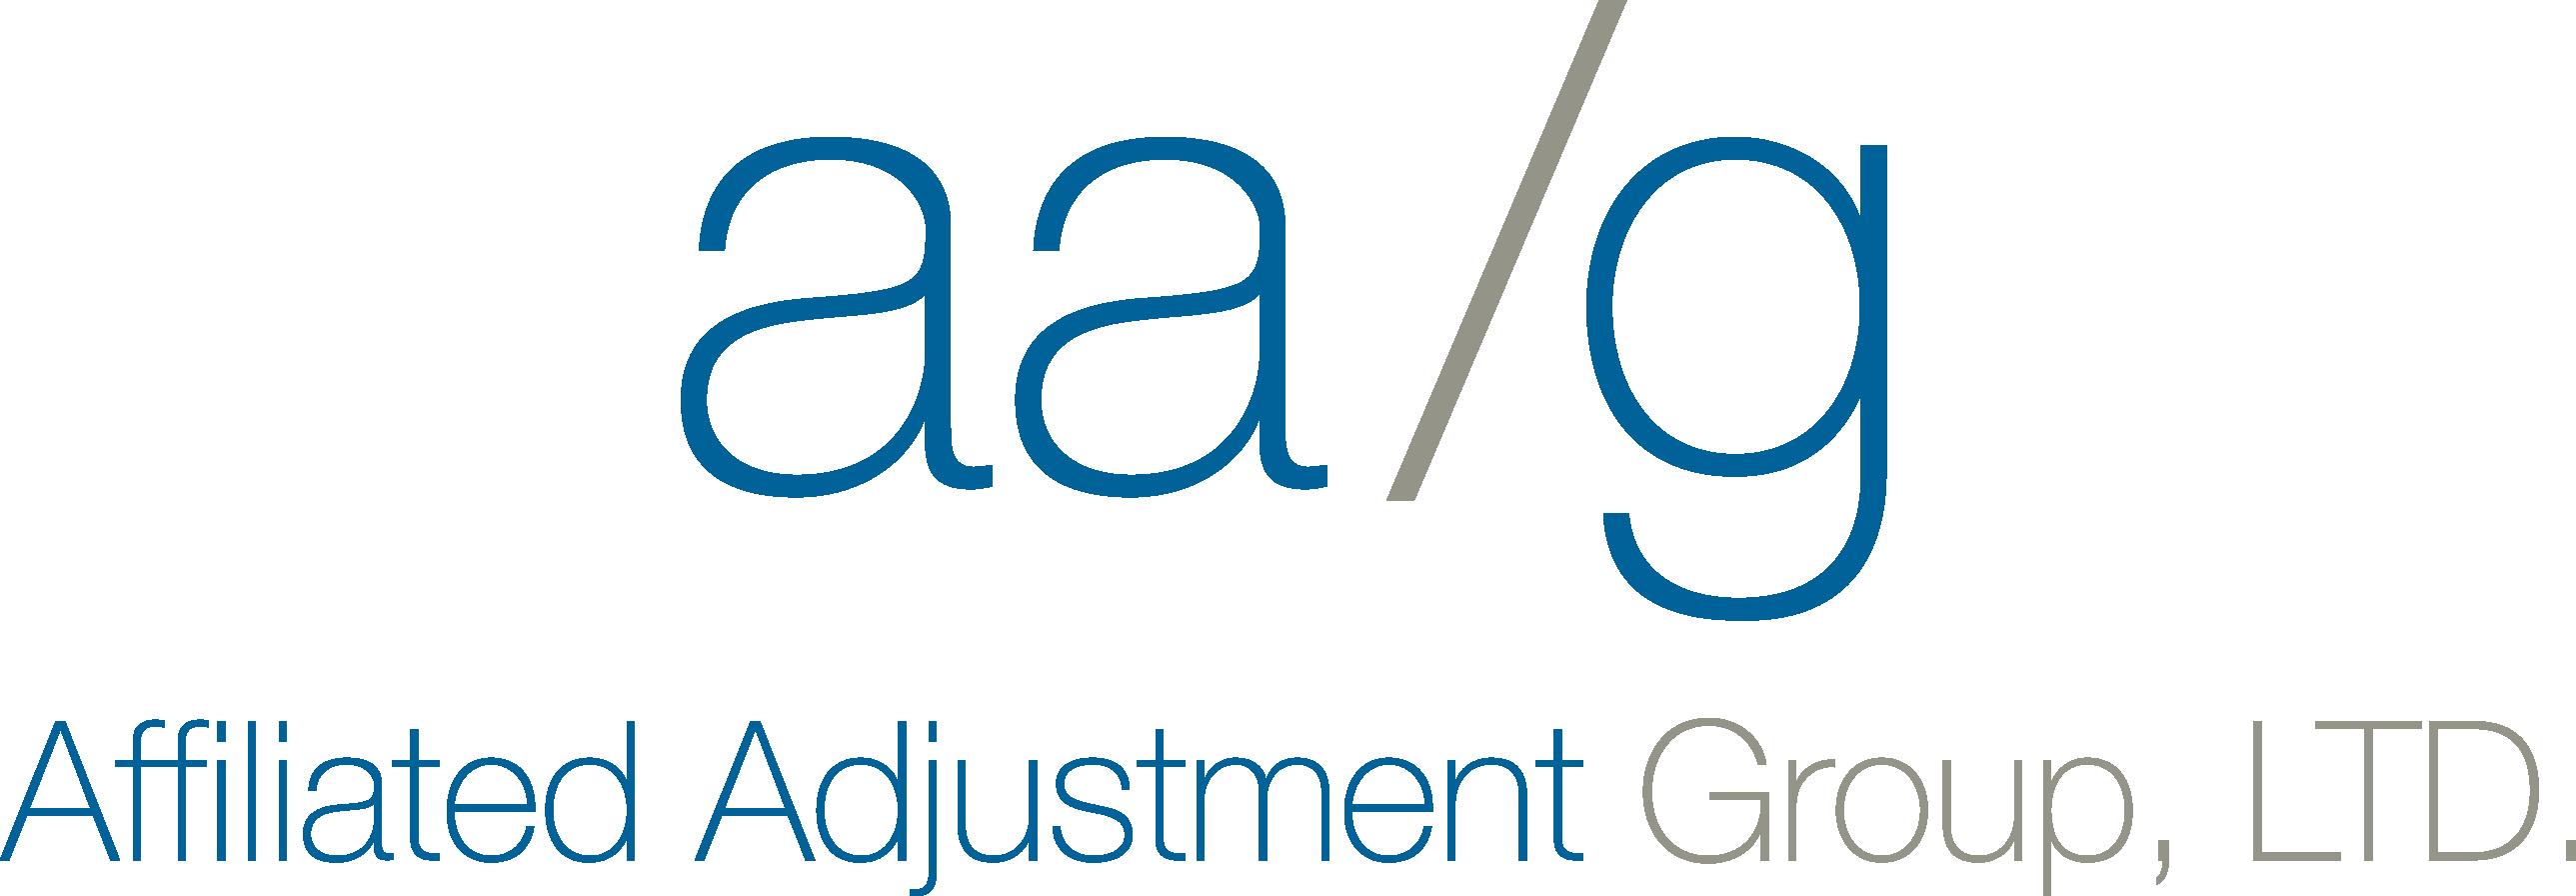 Affiliated Adjustment Group